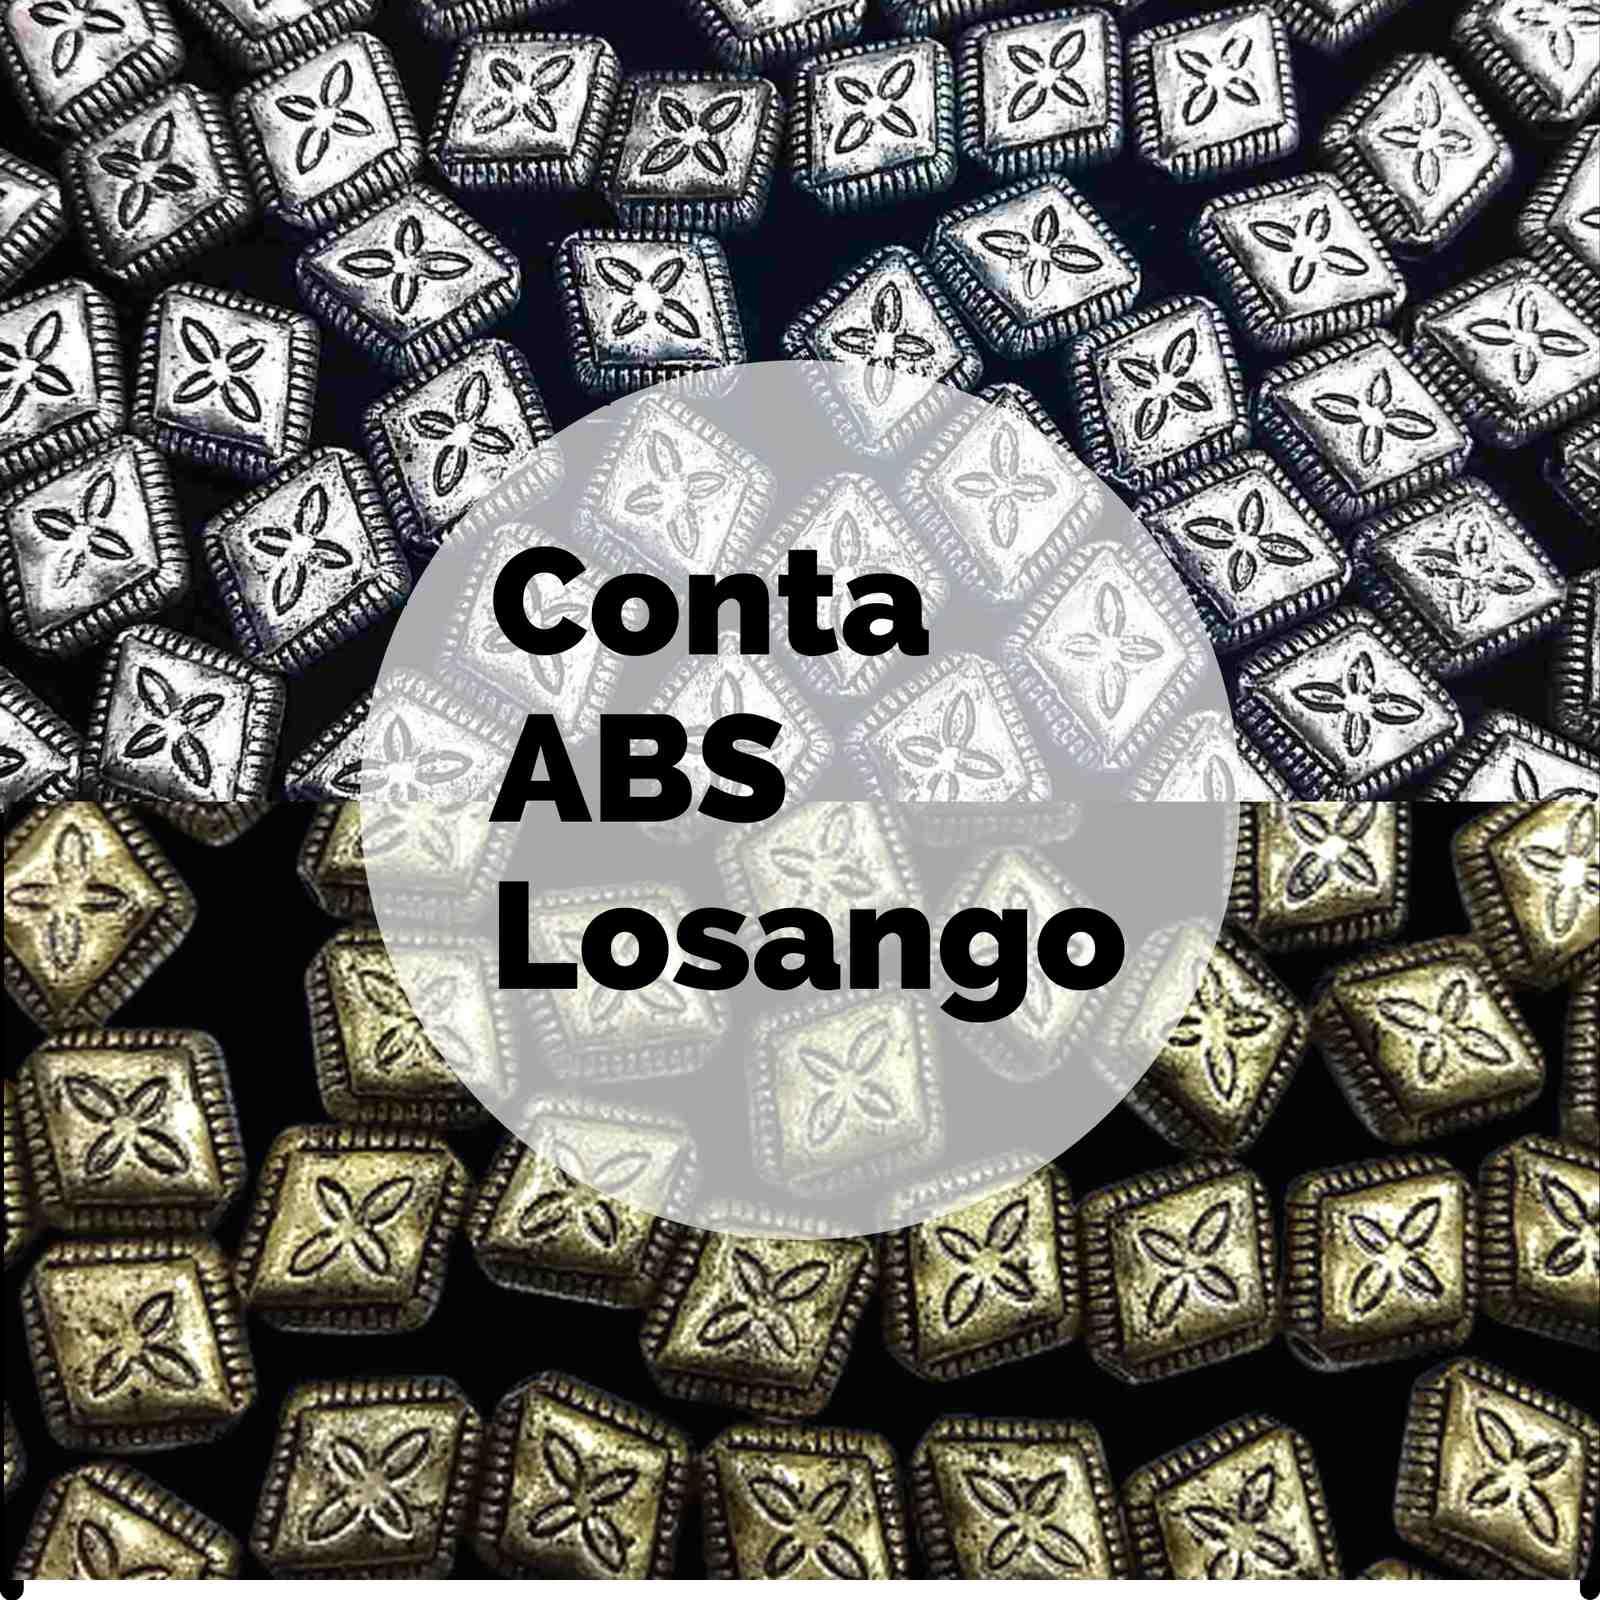 Conta ABS Passante Losango 10x12mm C/30 g